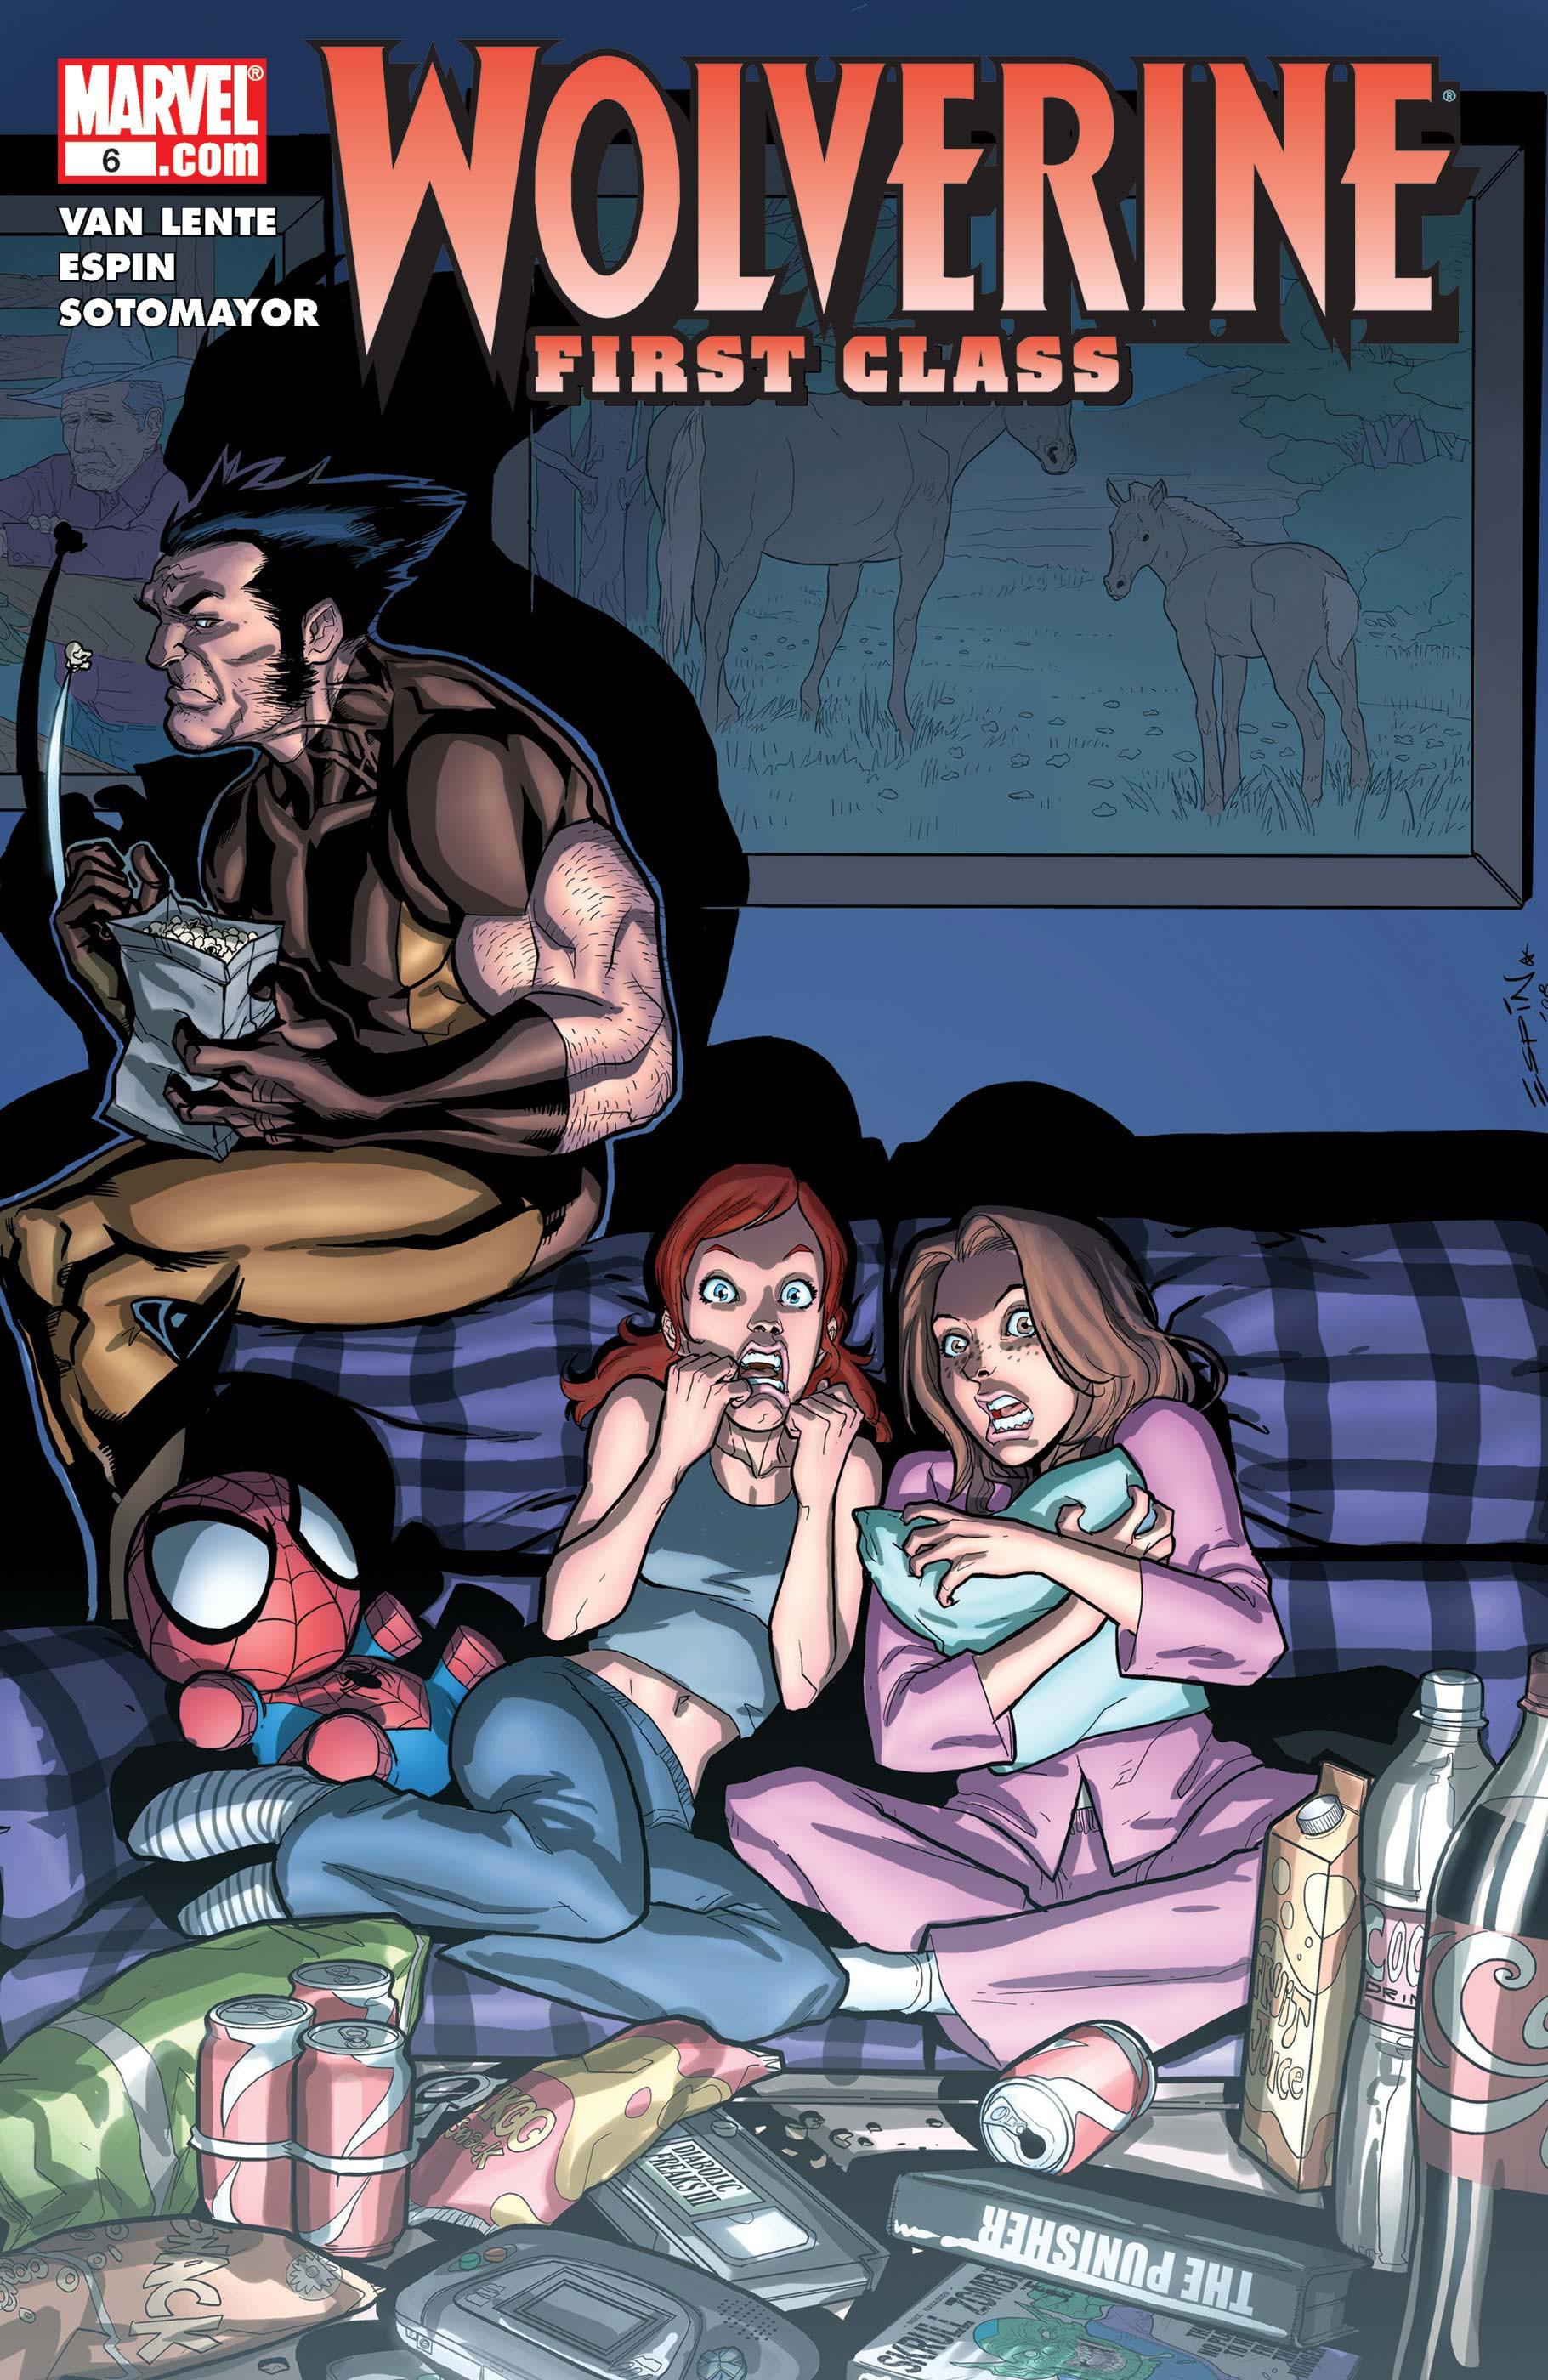 Wolverine: First Class Vol 1 6